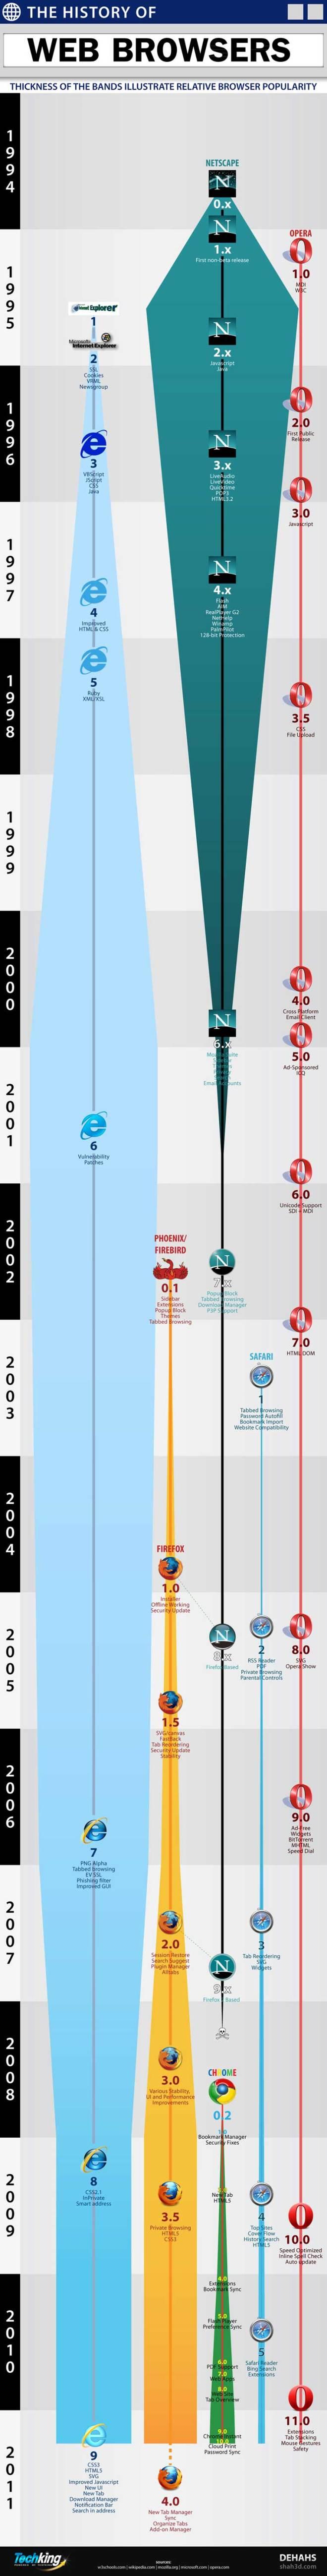 Evolución de los Navegadores Web [Infografía]